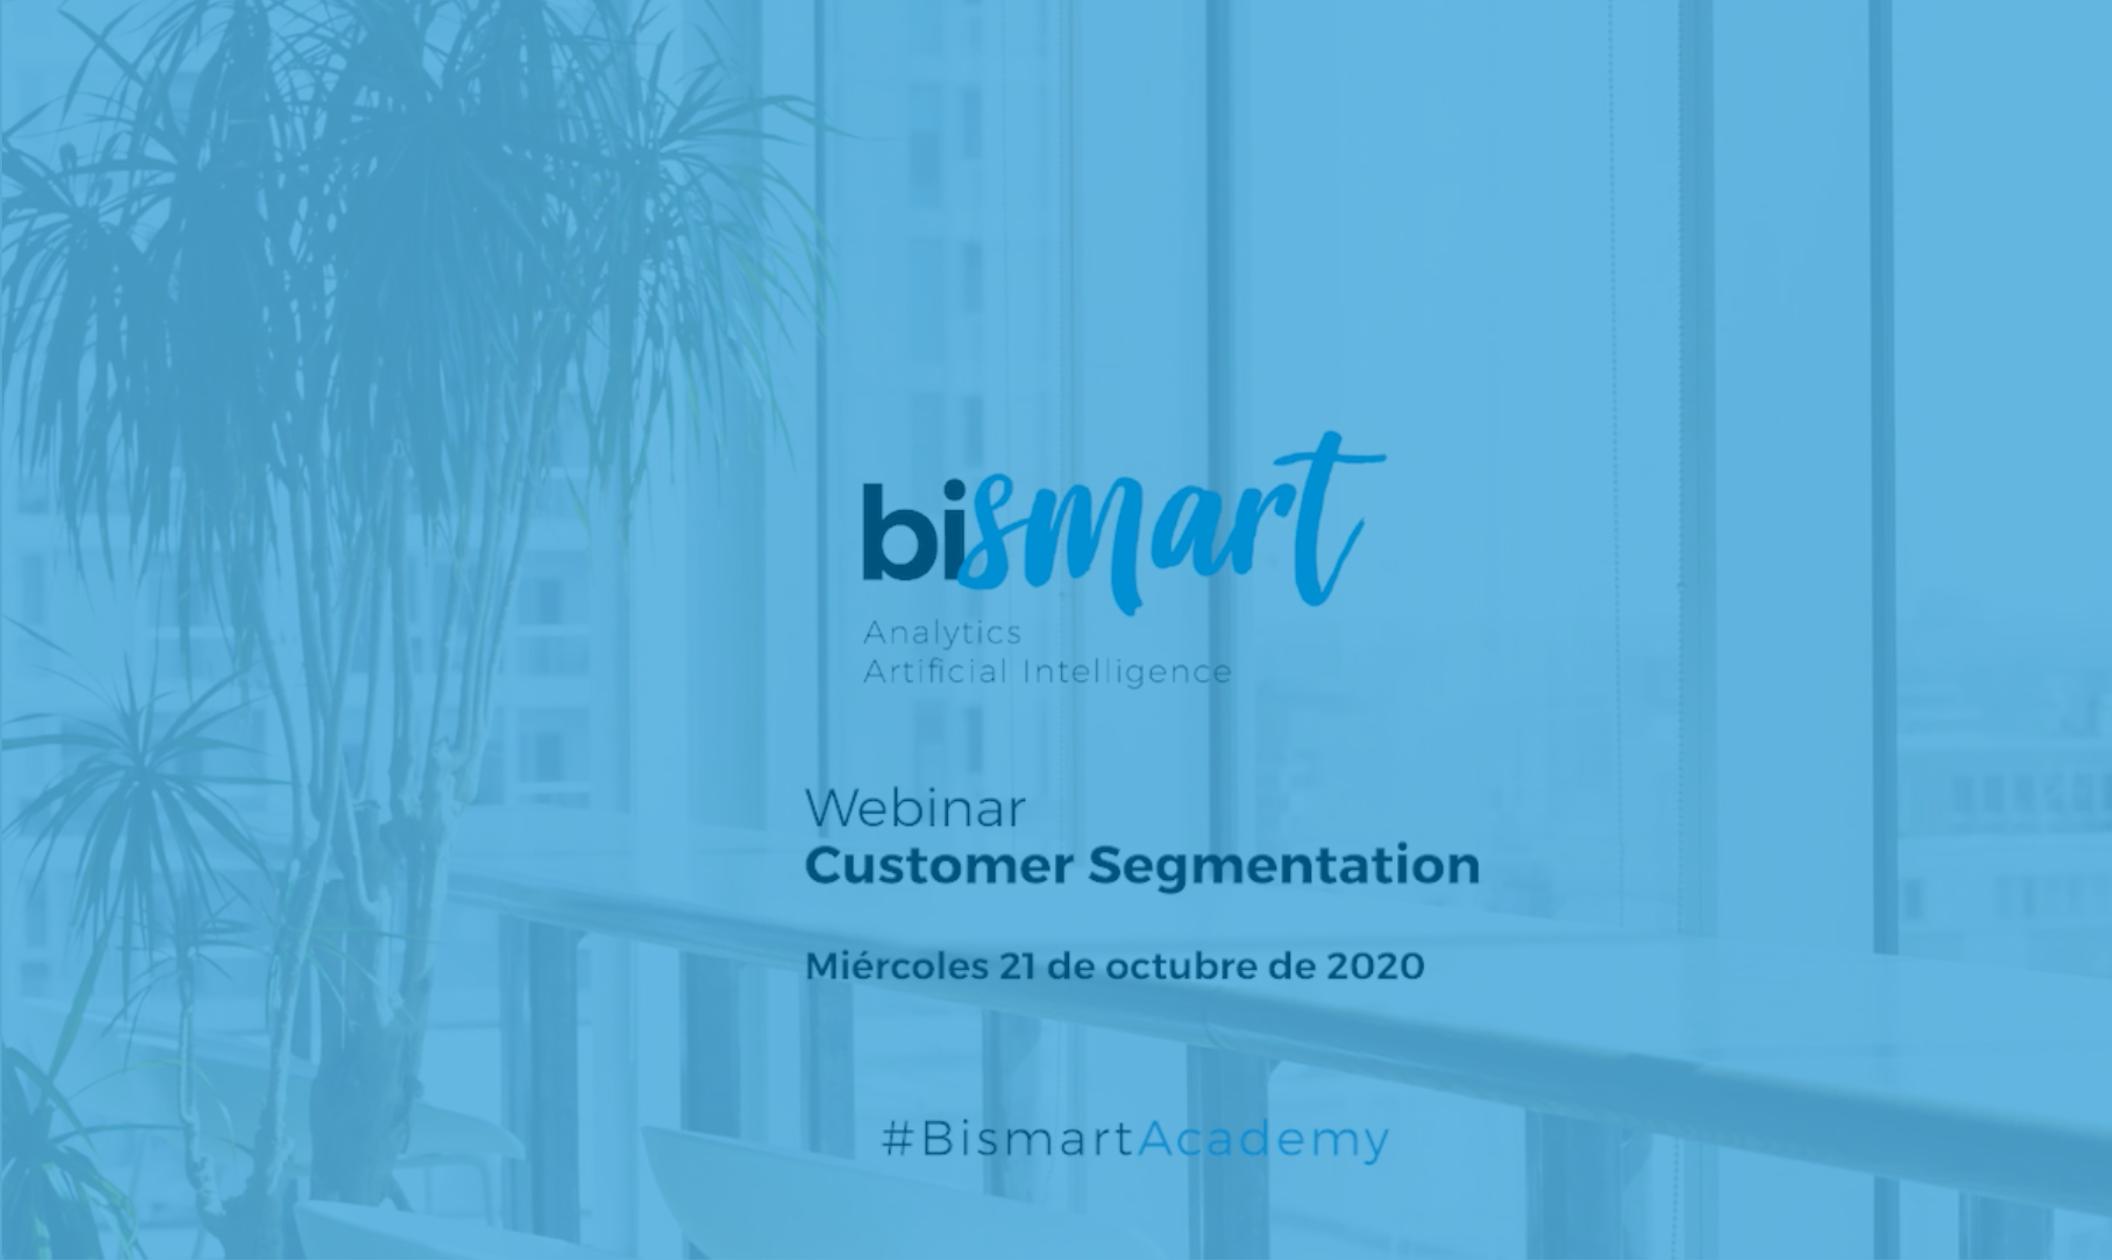 Bismart Webinar Customer Segmentation